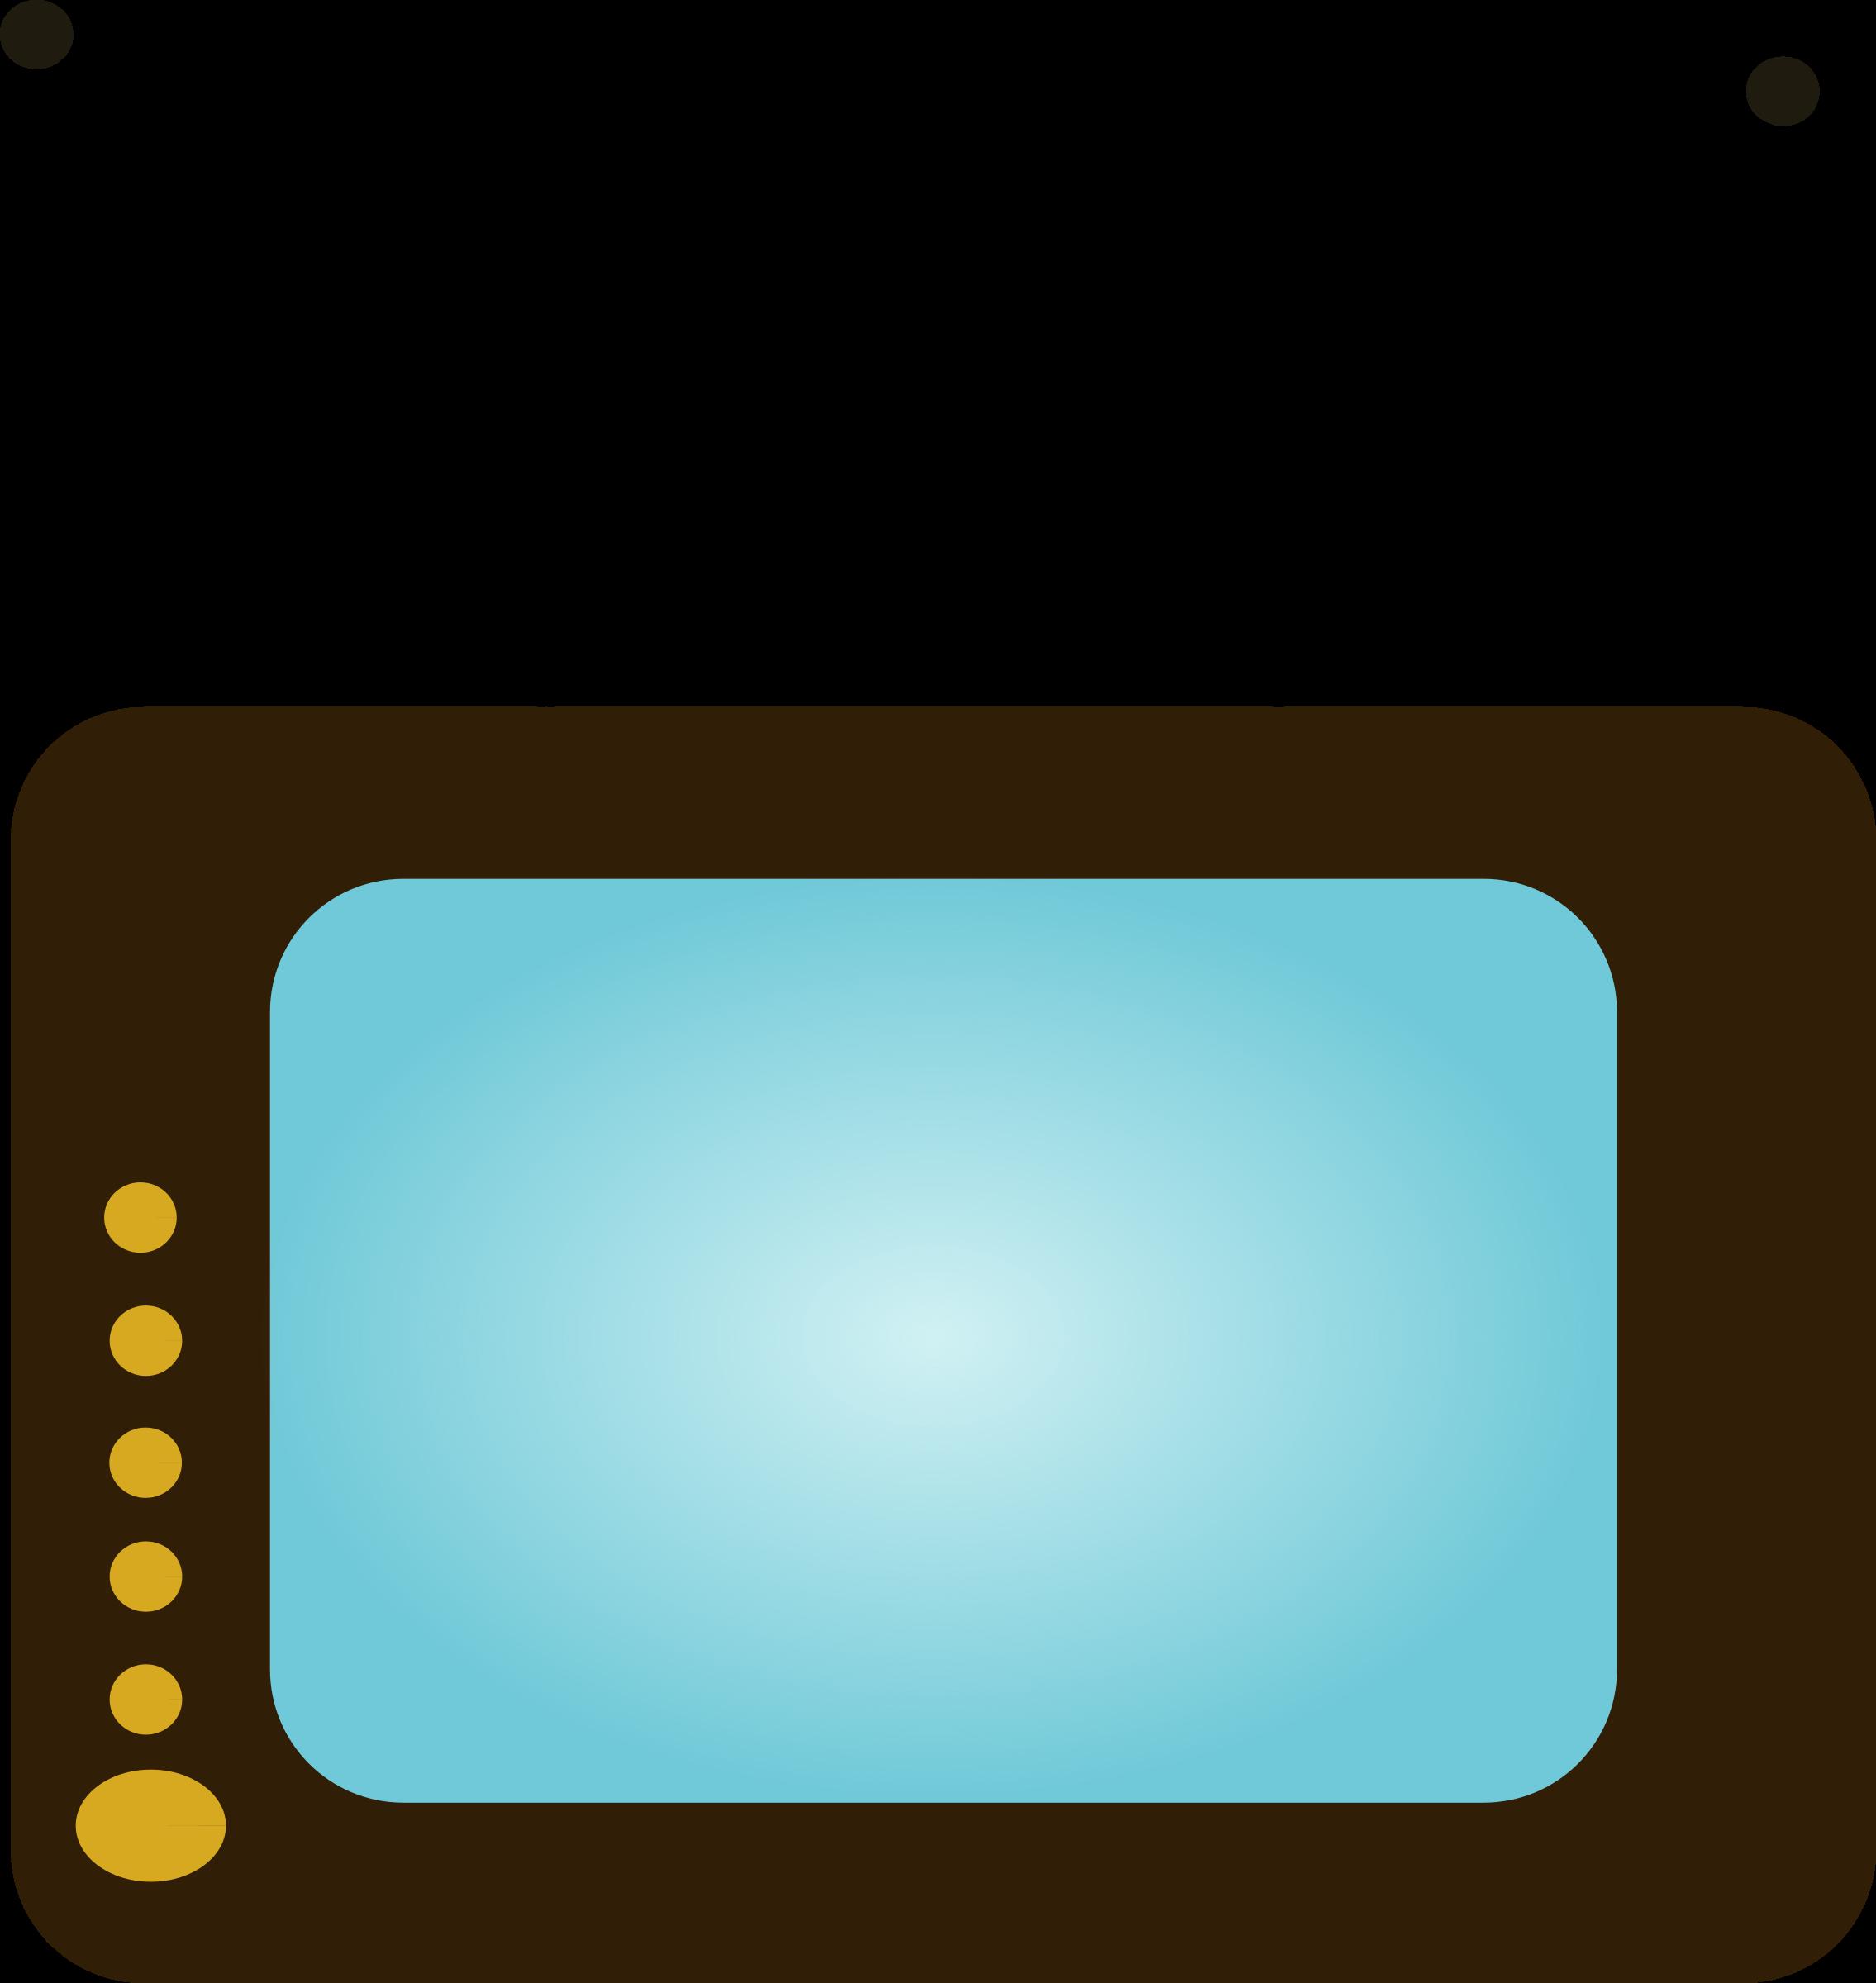 Set big image png. Television clipart blue tv